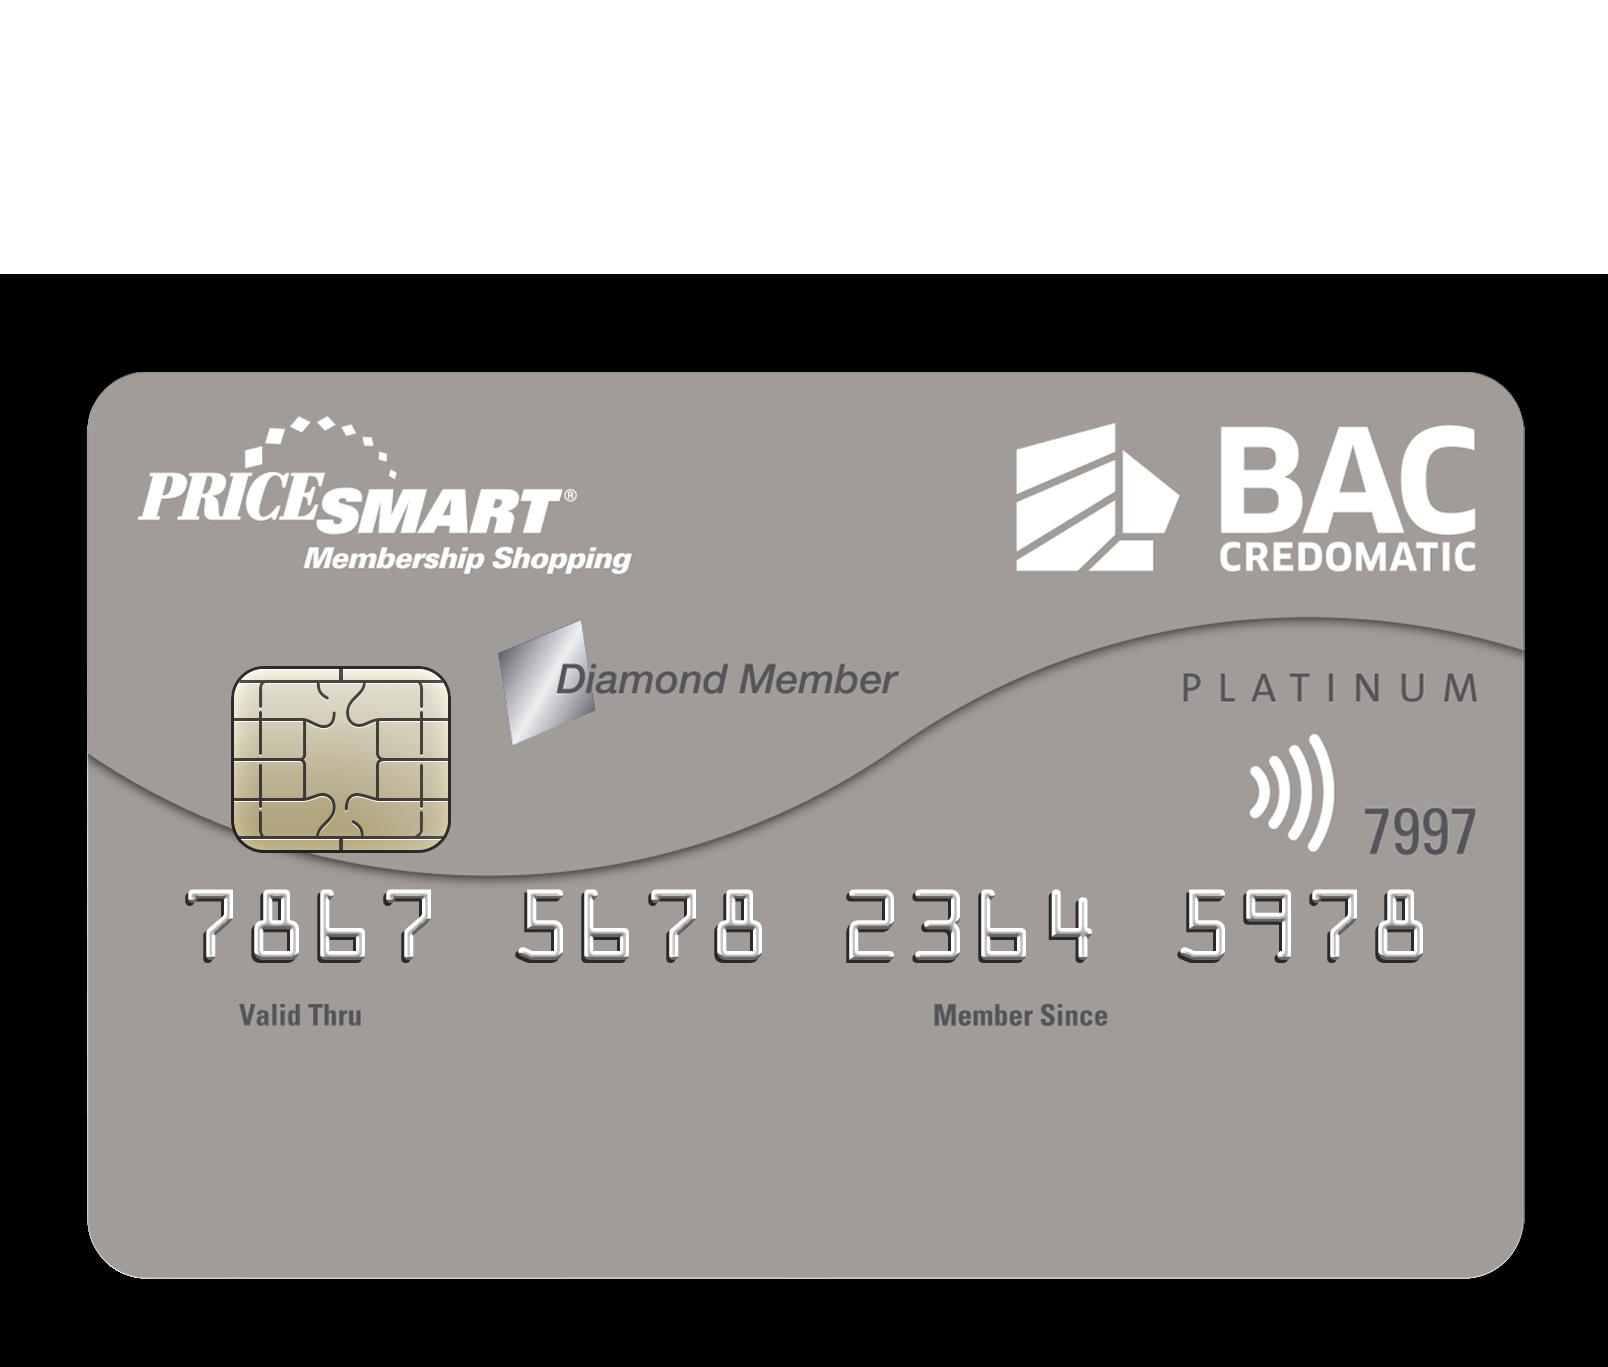 Tarjeta de Crédito Pricesmart American Express BAC Credomatic Platino